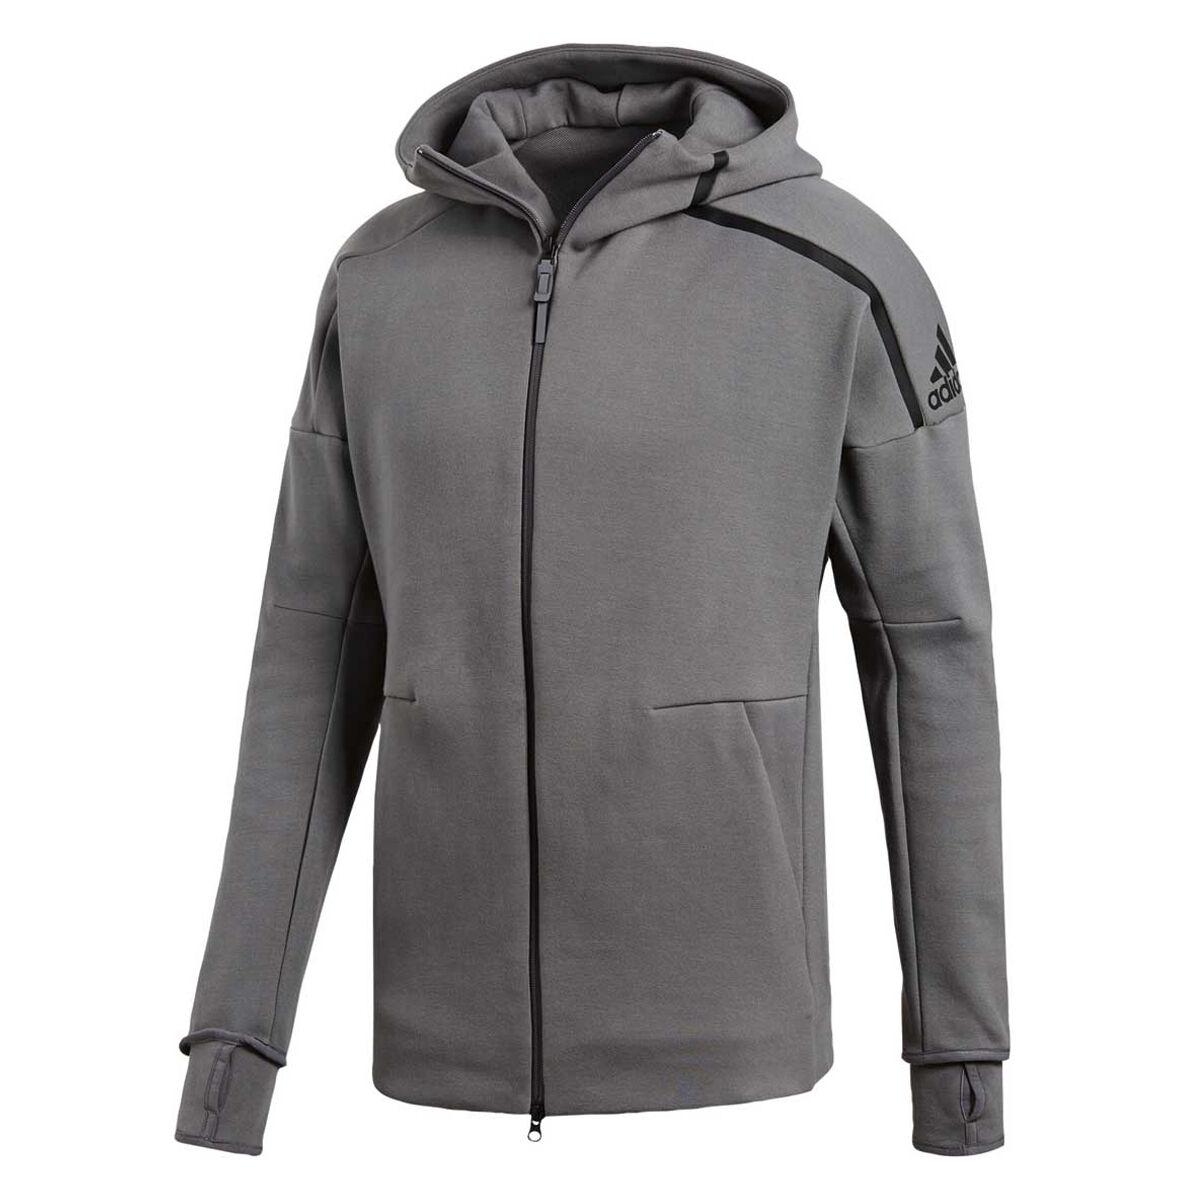 b5d5cb21f3fe ... discount adidas mens z.n.e 2 hoodie grey s grey rebelhi res 7214f ced0f